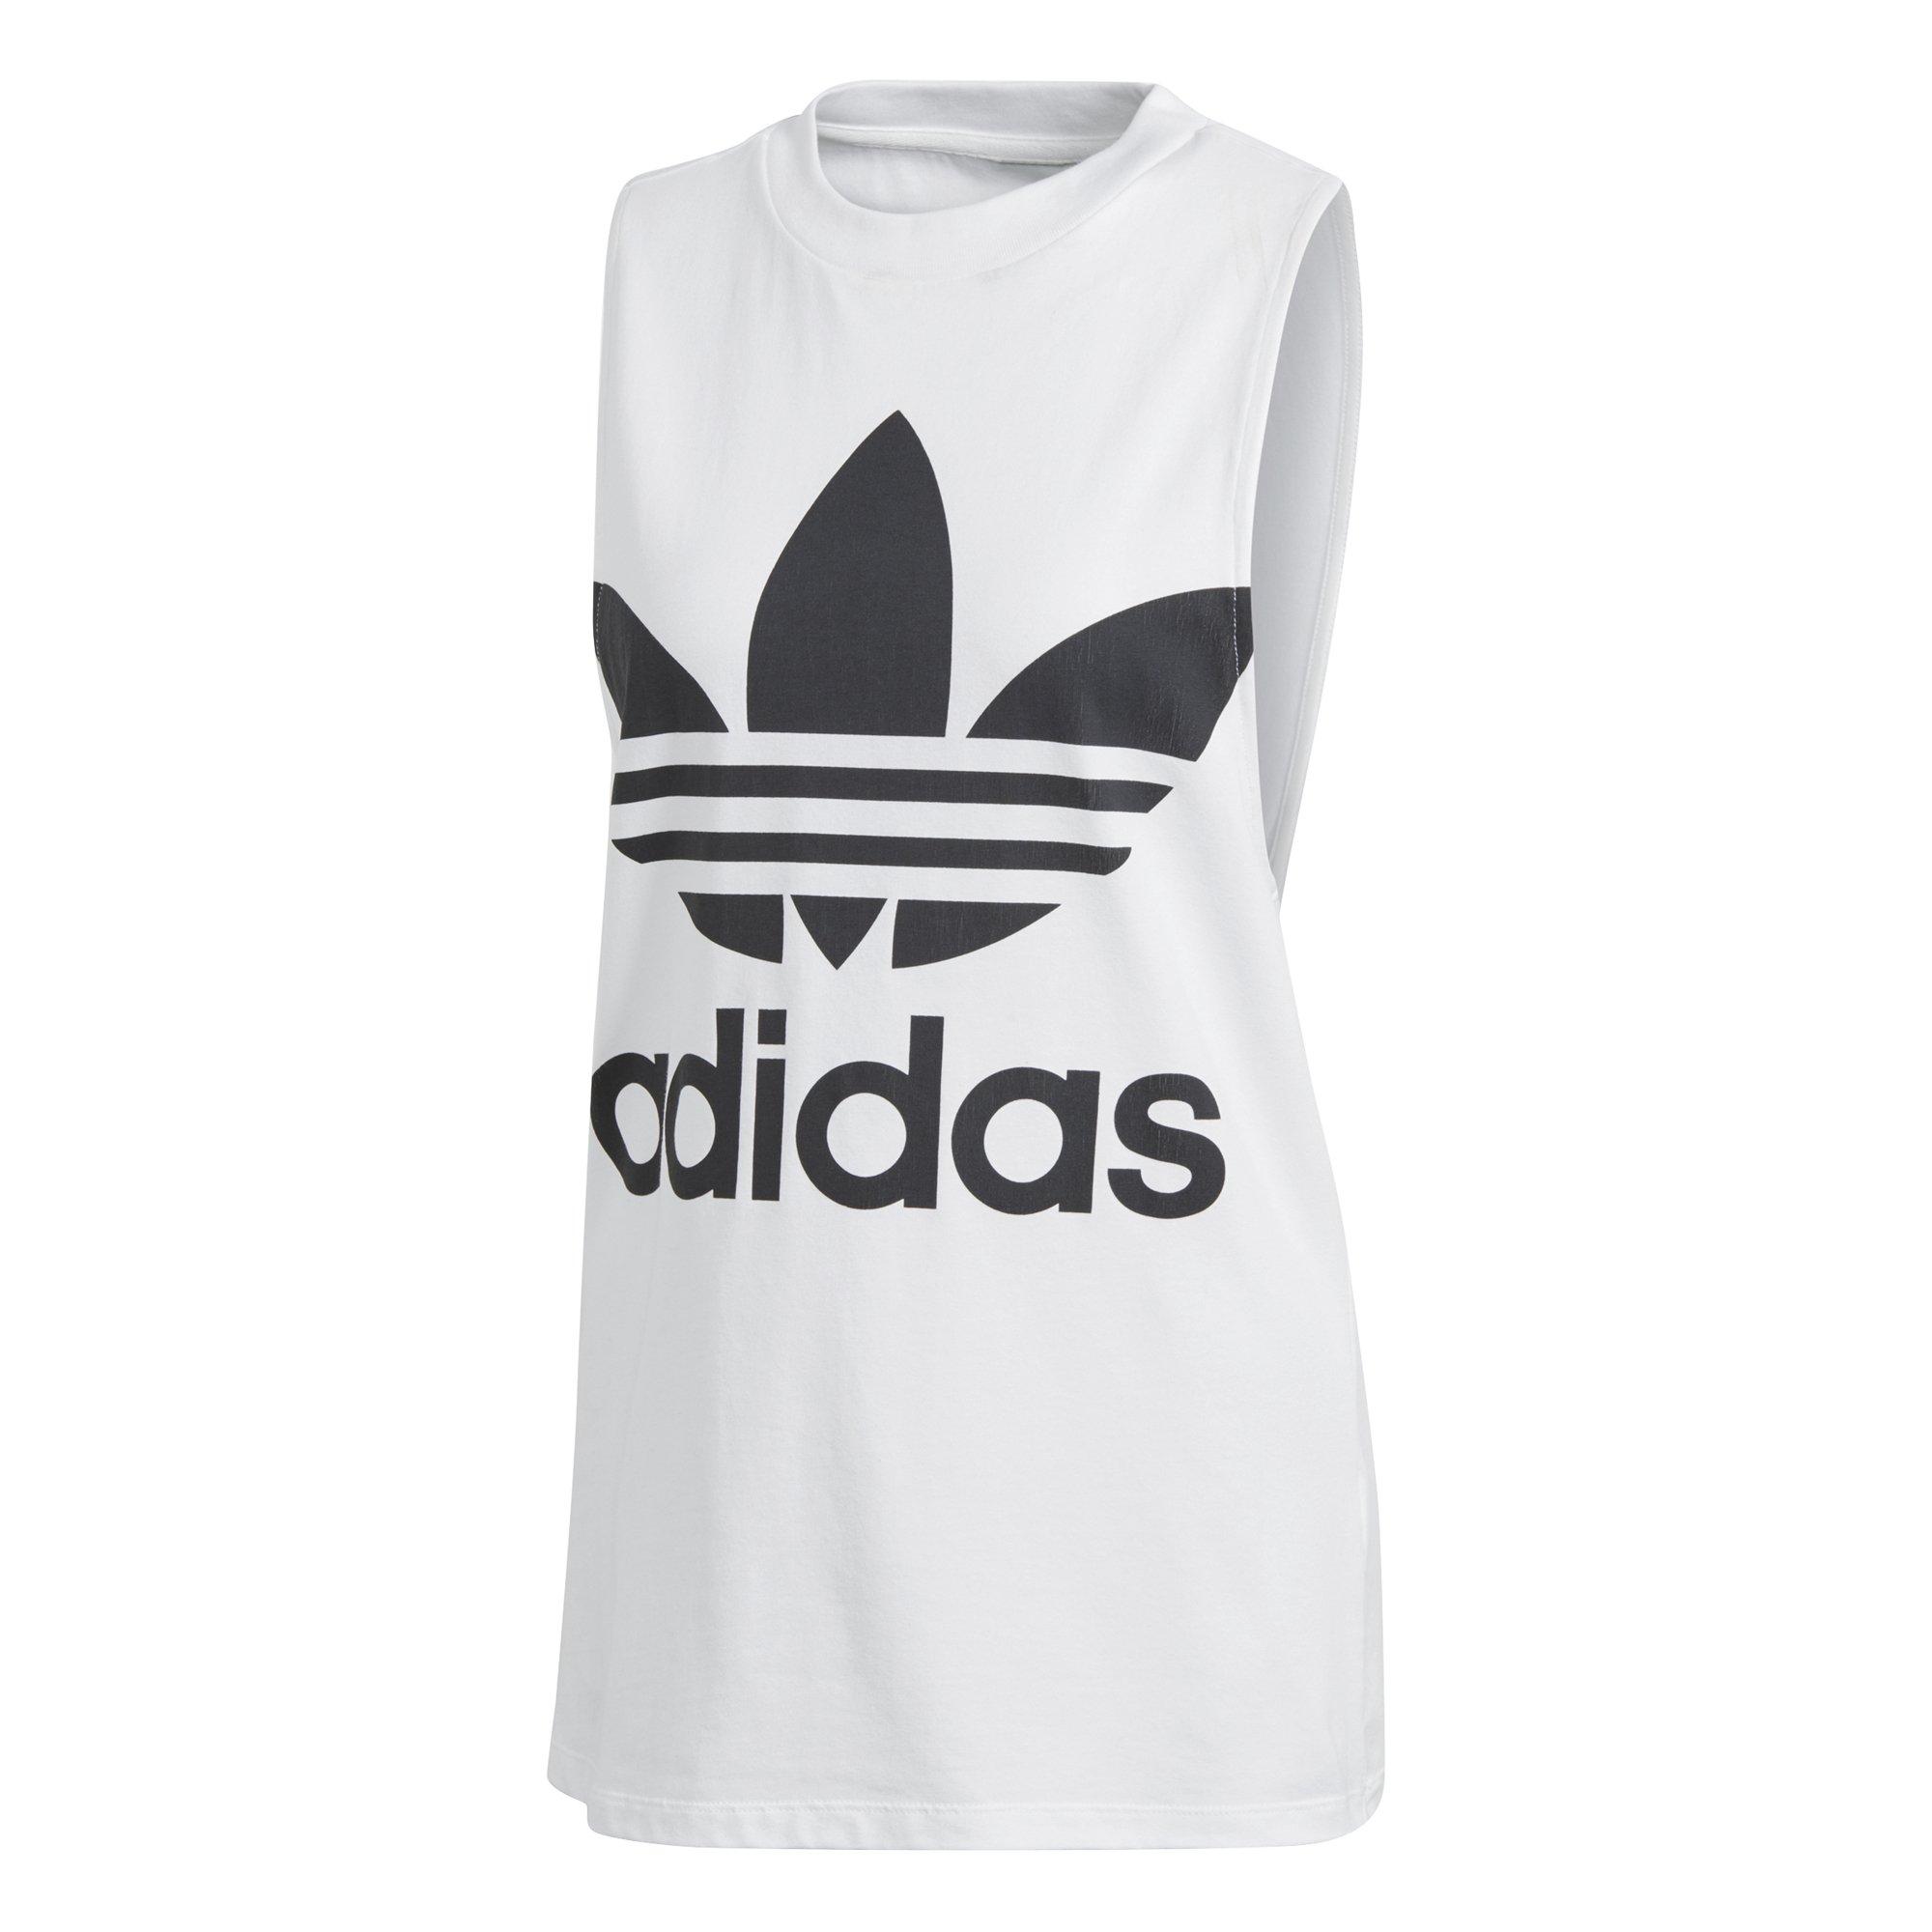 adidas Women's Trefoil Tank Top, White/Black, XL